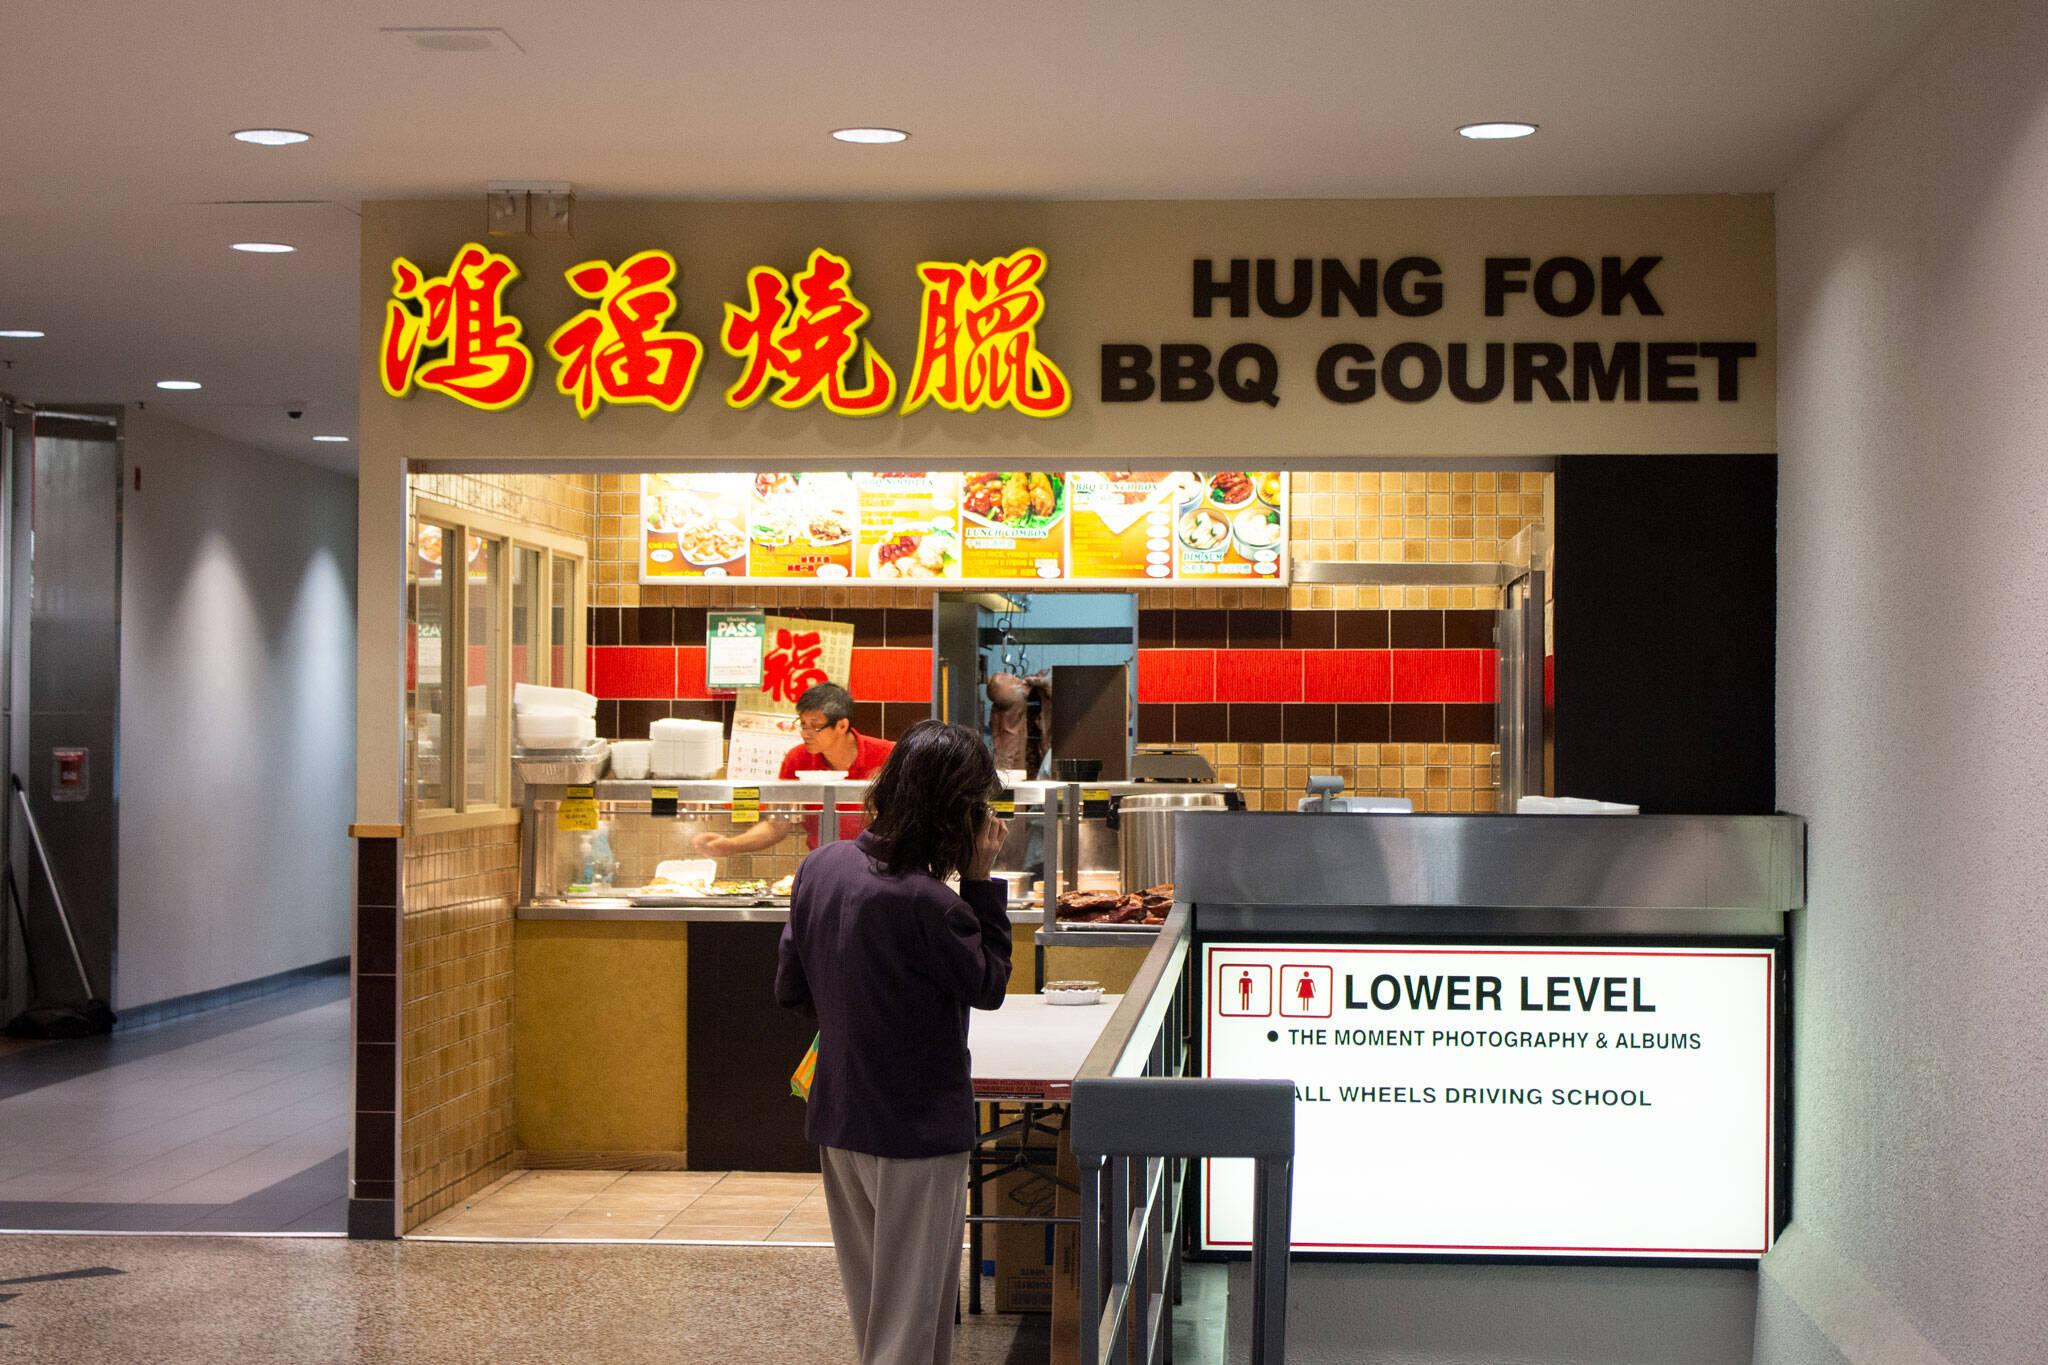 hung fok gourmet bbq toronto